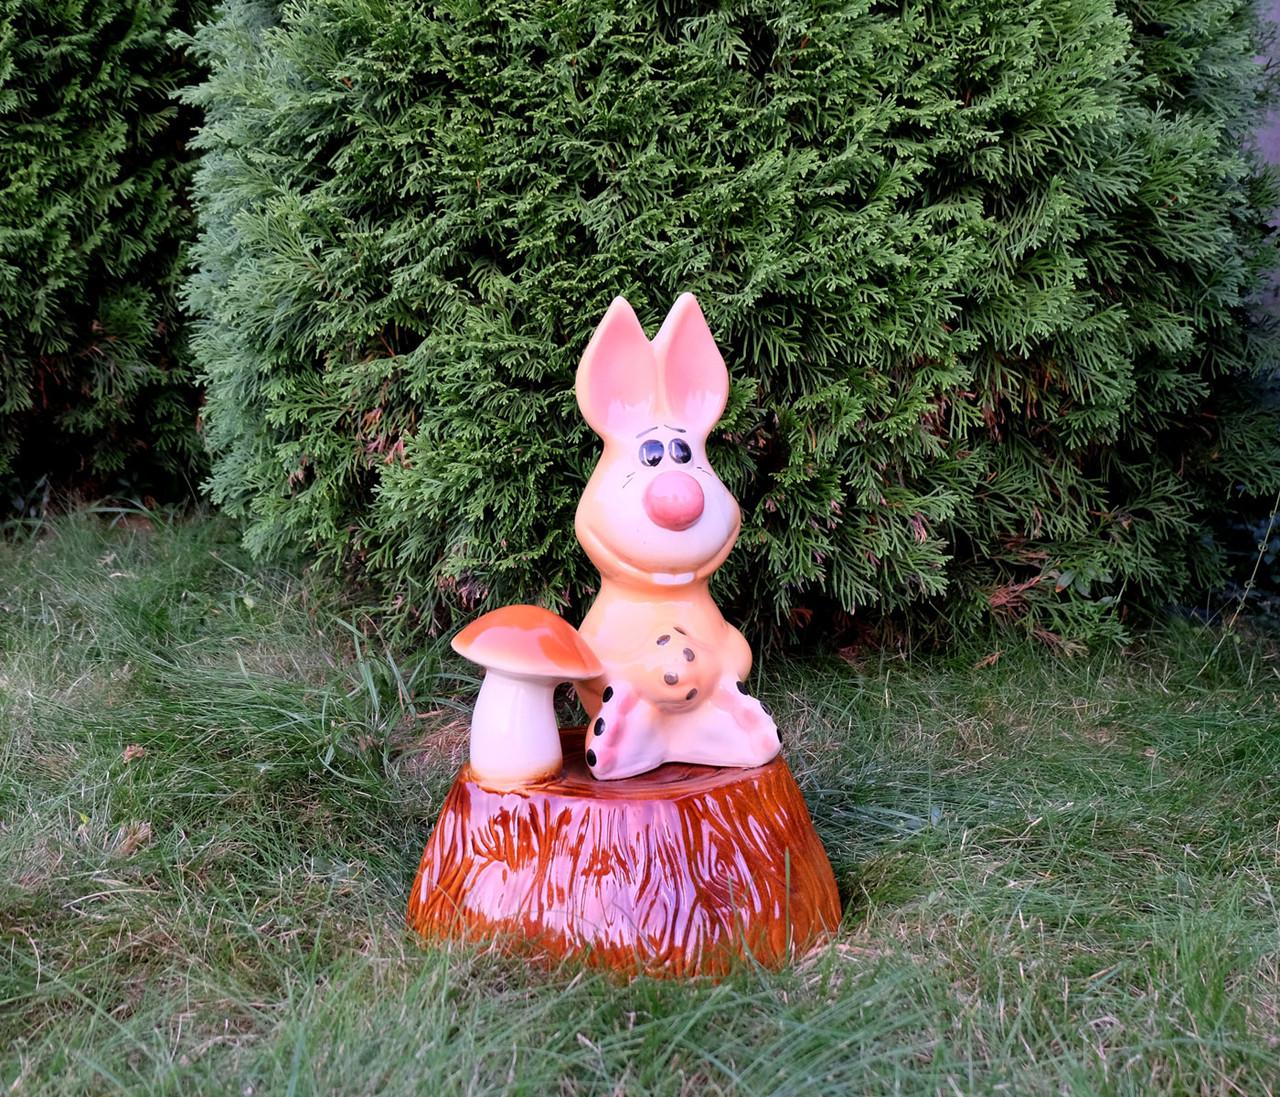 Зая на пне - садовой декор 39х26 см керамика (810)